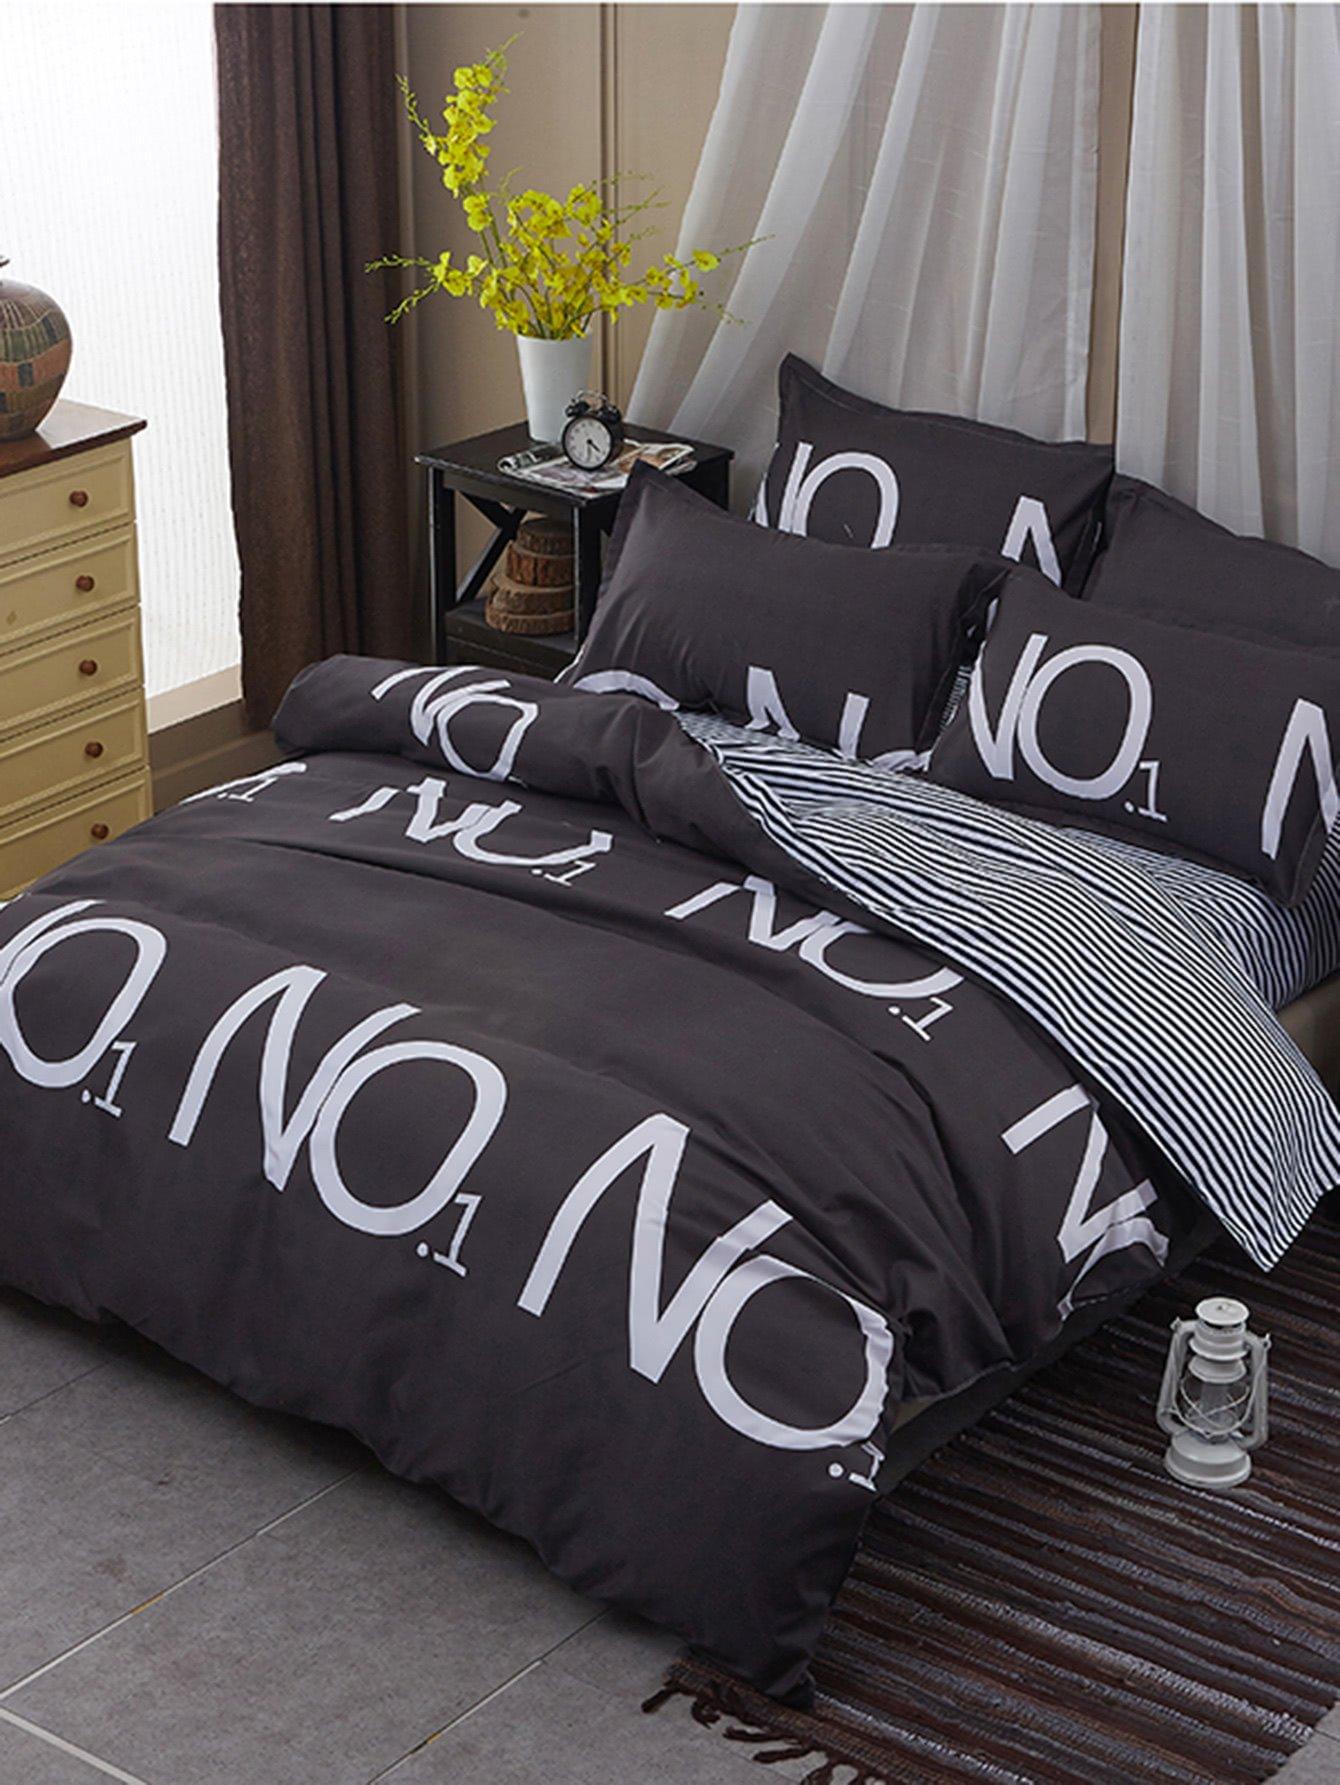 diamondpique matouk bed by duvet pique scallop cover diamond